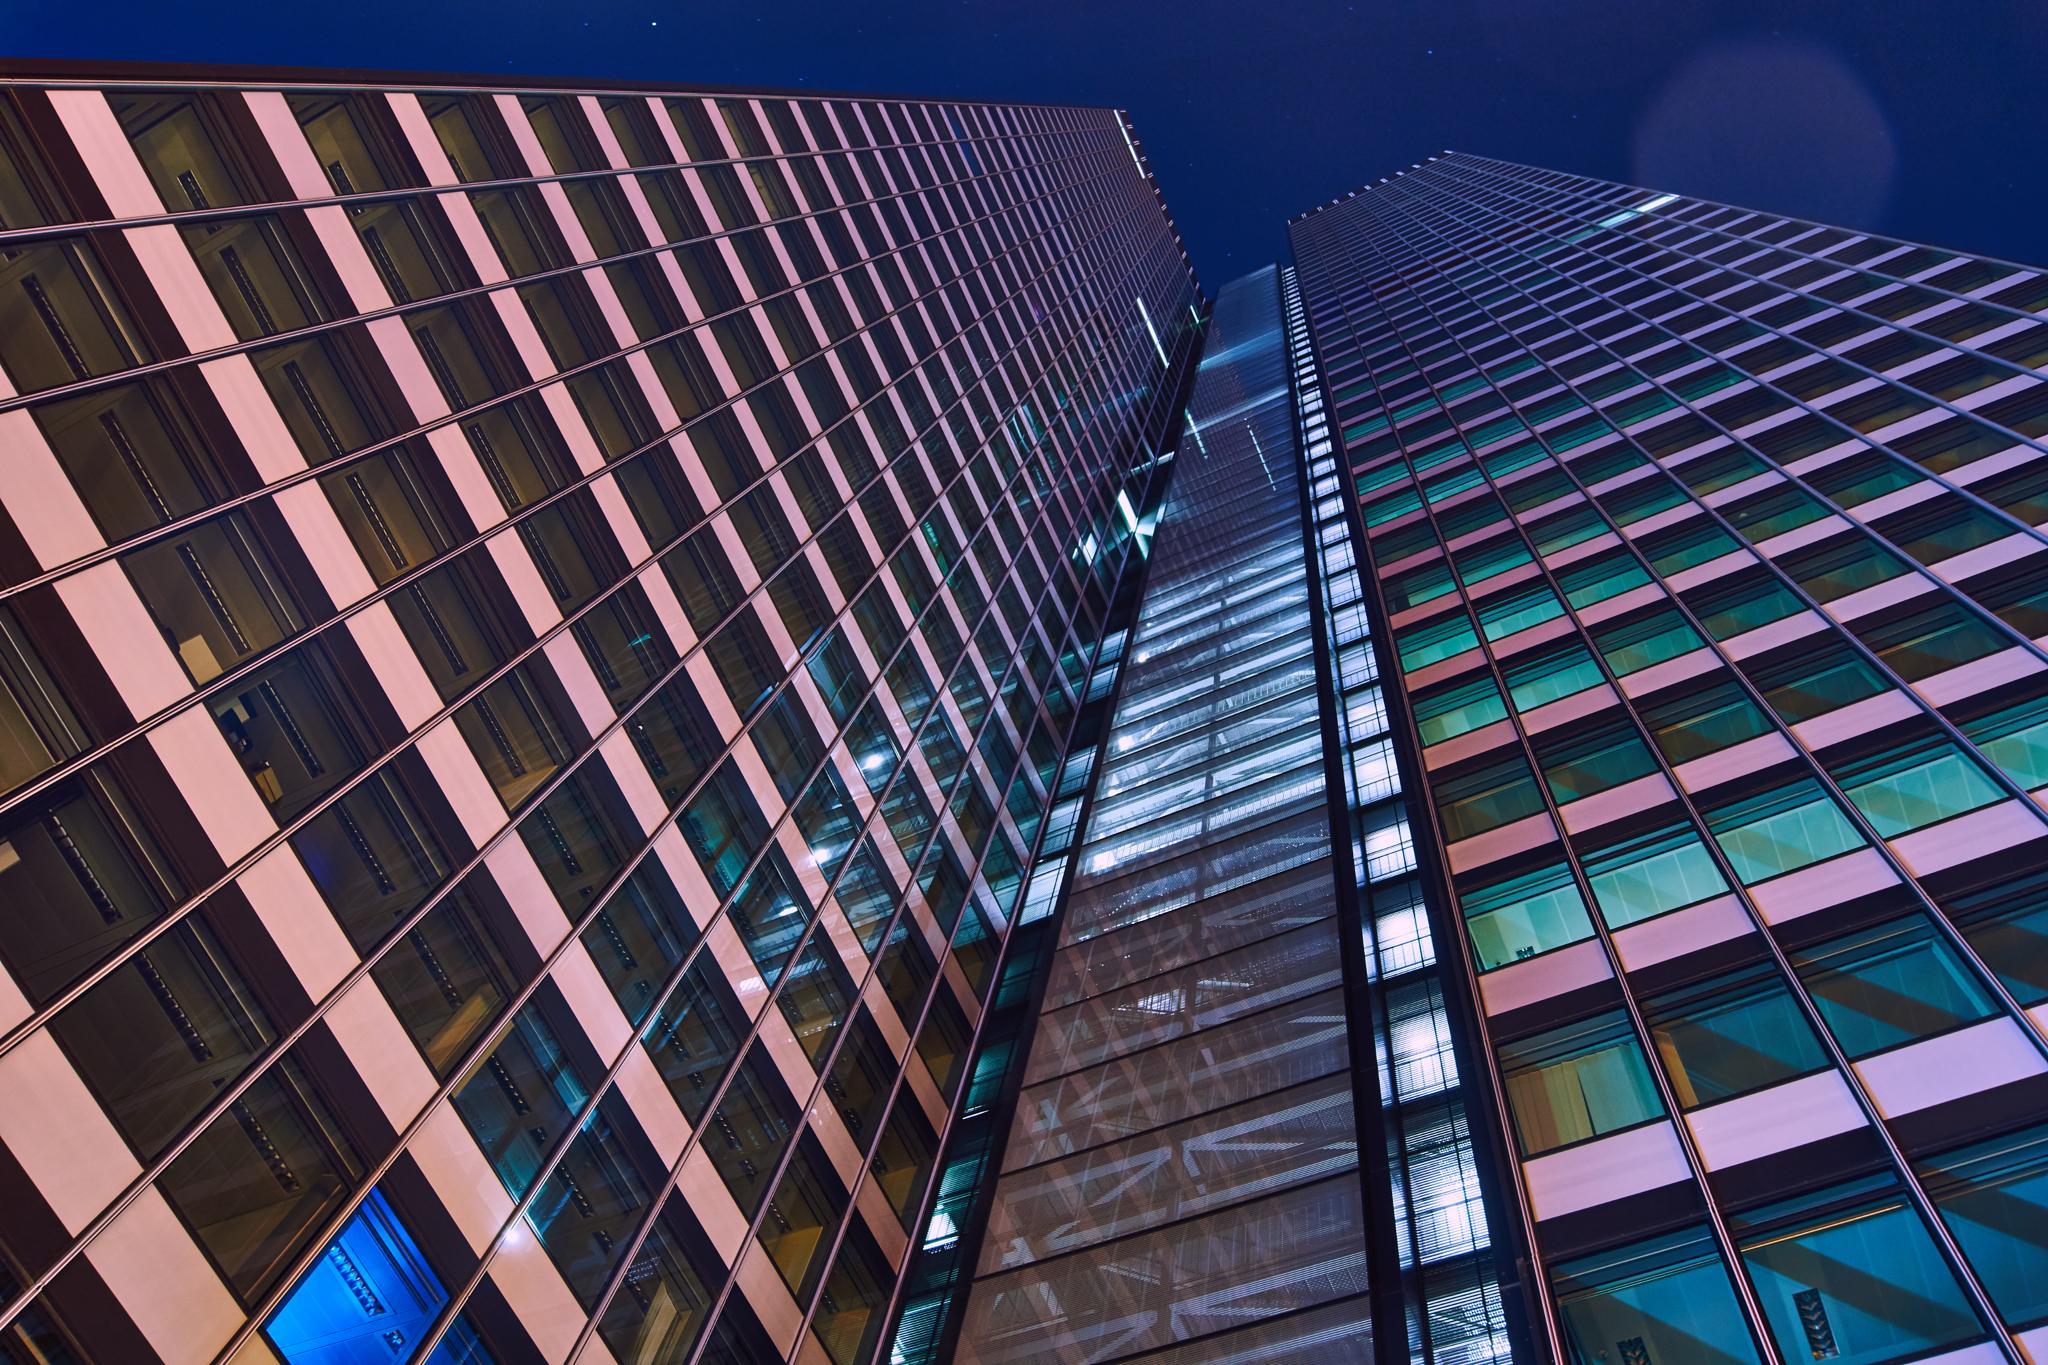 Frankfurt DZ Tower by Ahmet.Bozkurt